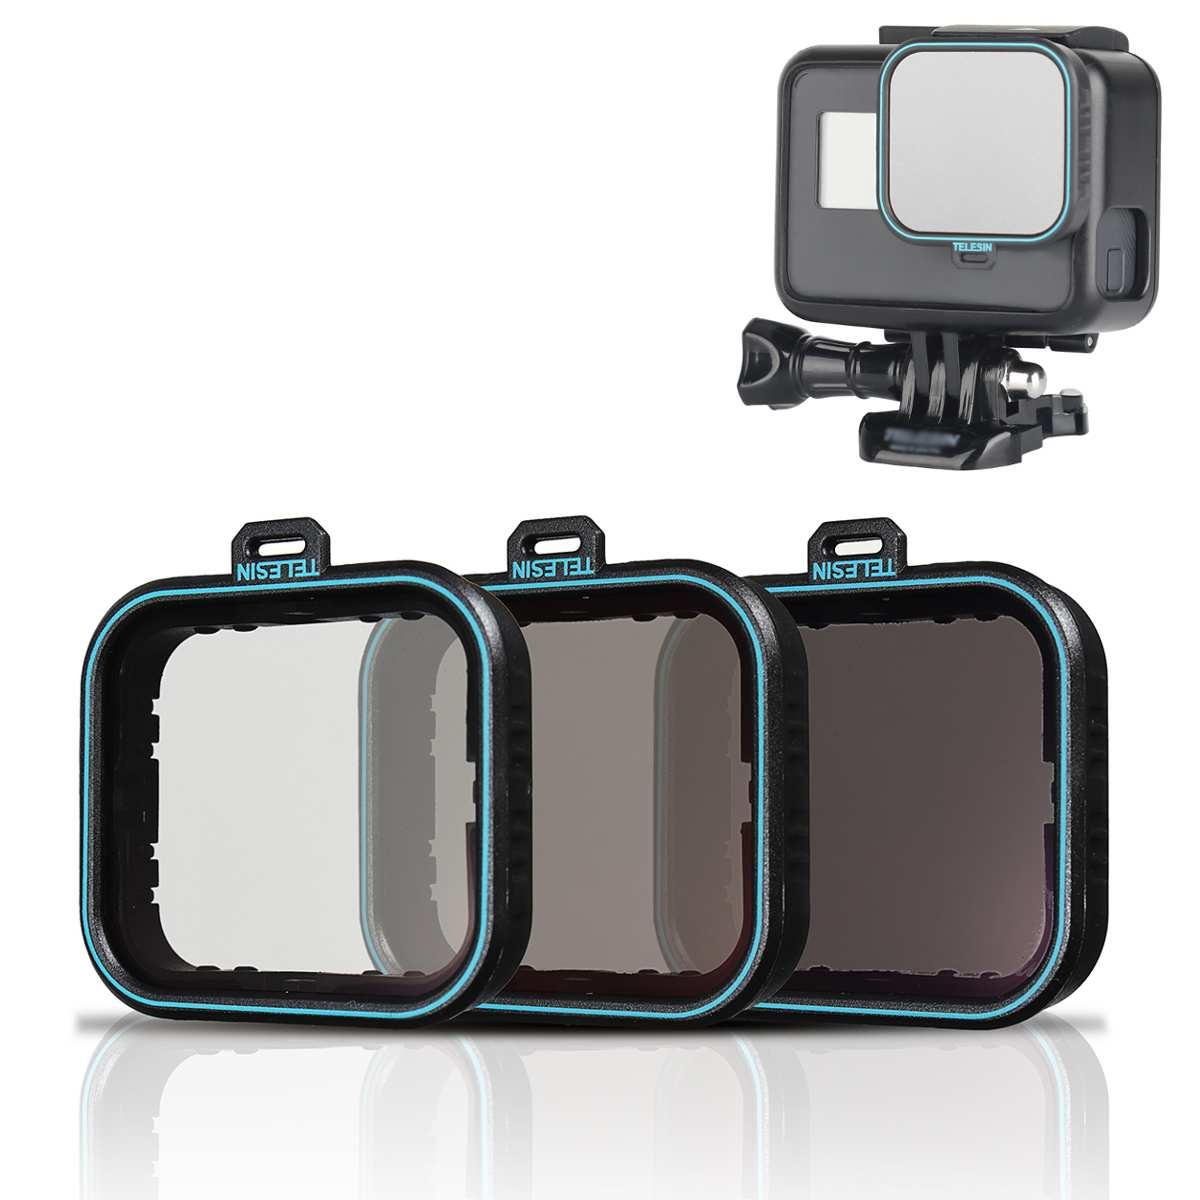 Suppion 1PC ND4-PL//ND8-PL//ND16-PL//ND32-PL//ND64-PL Camera Lens Filters for DJI OSMO Pocket